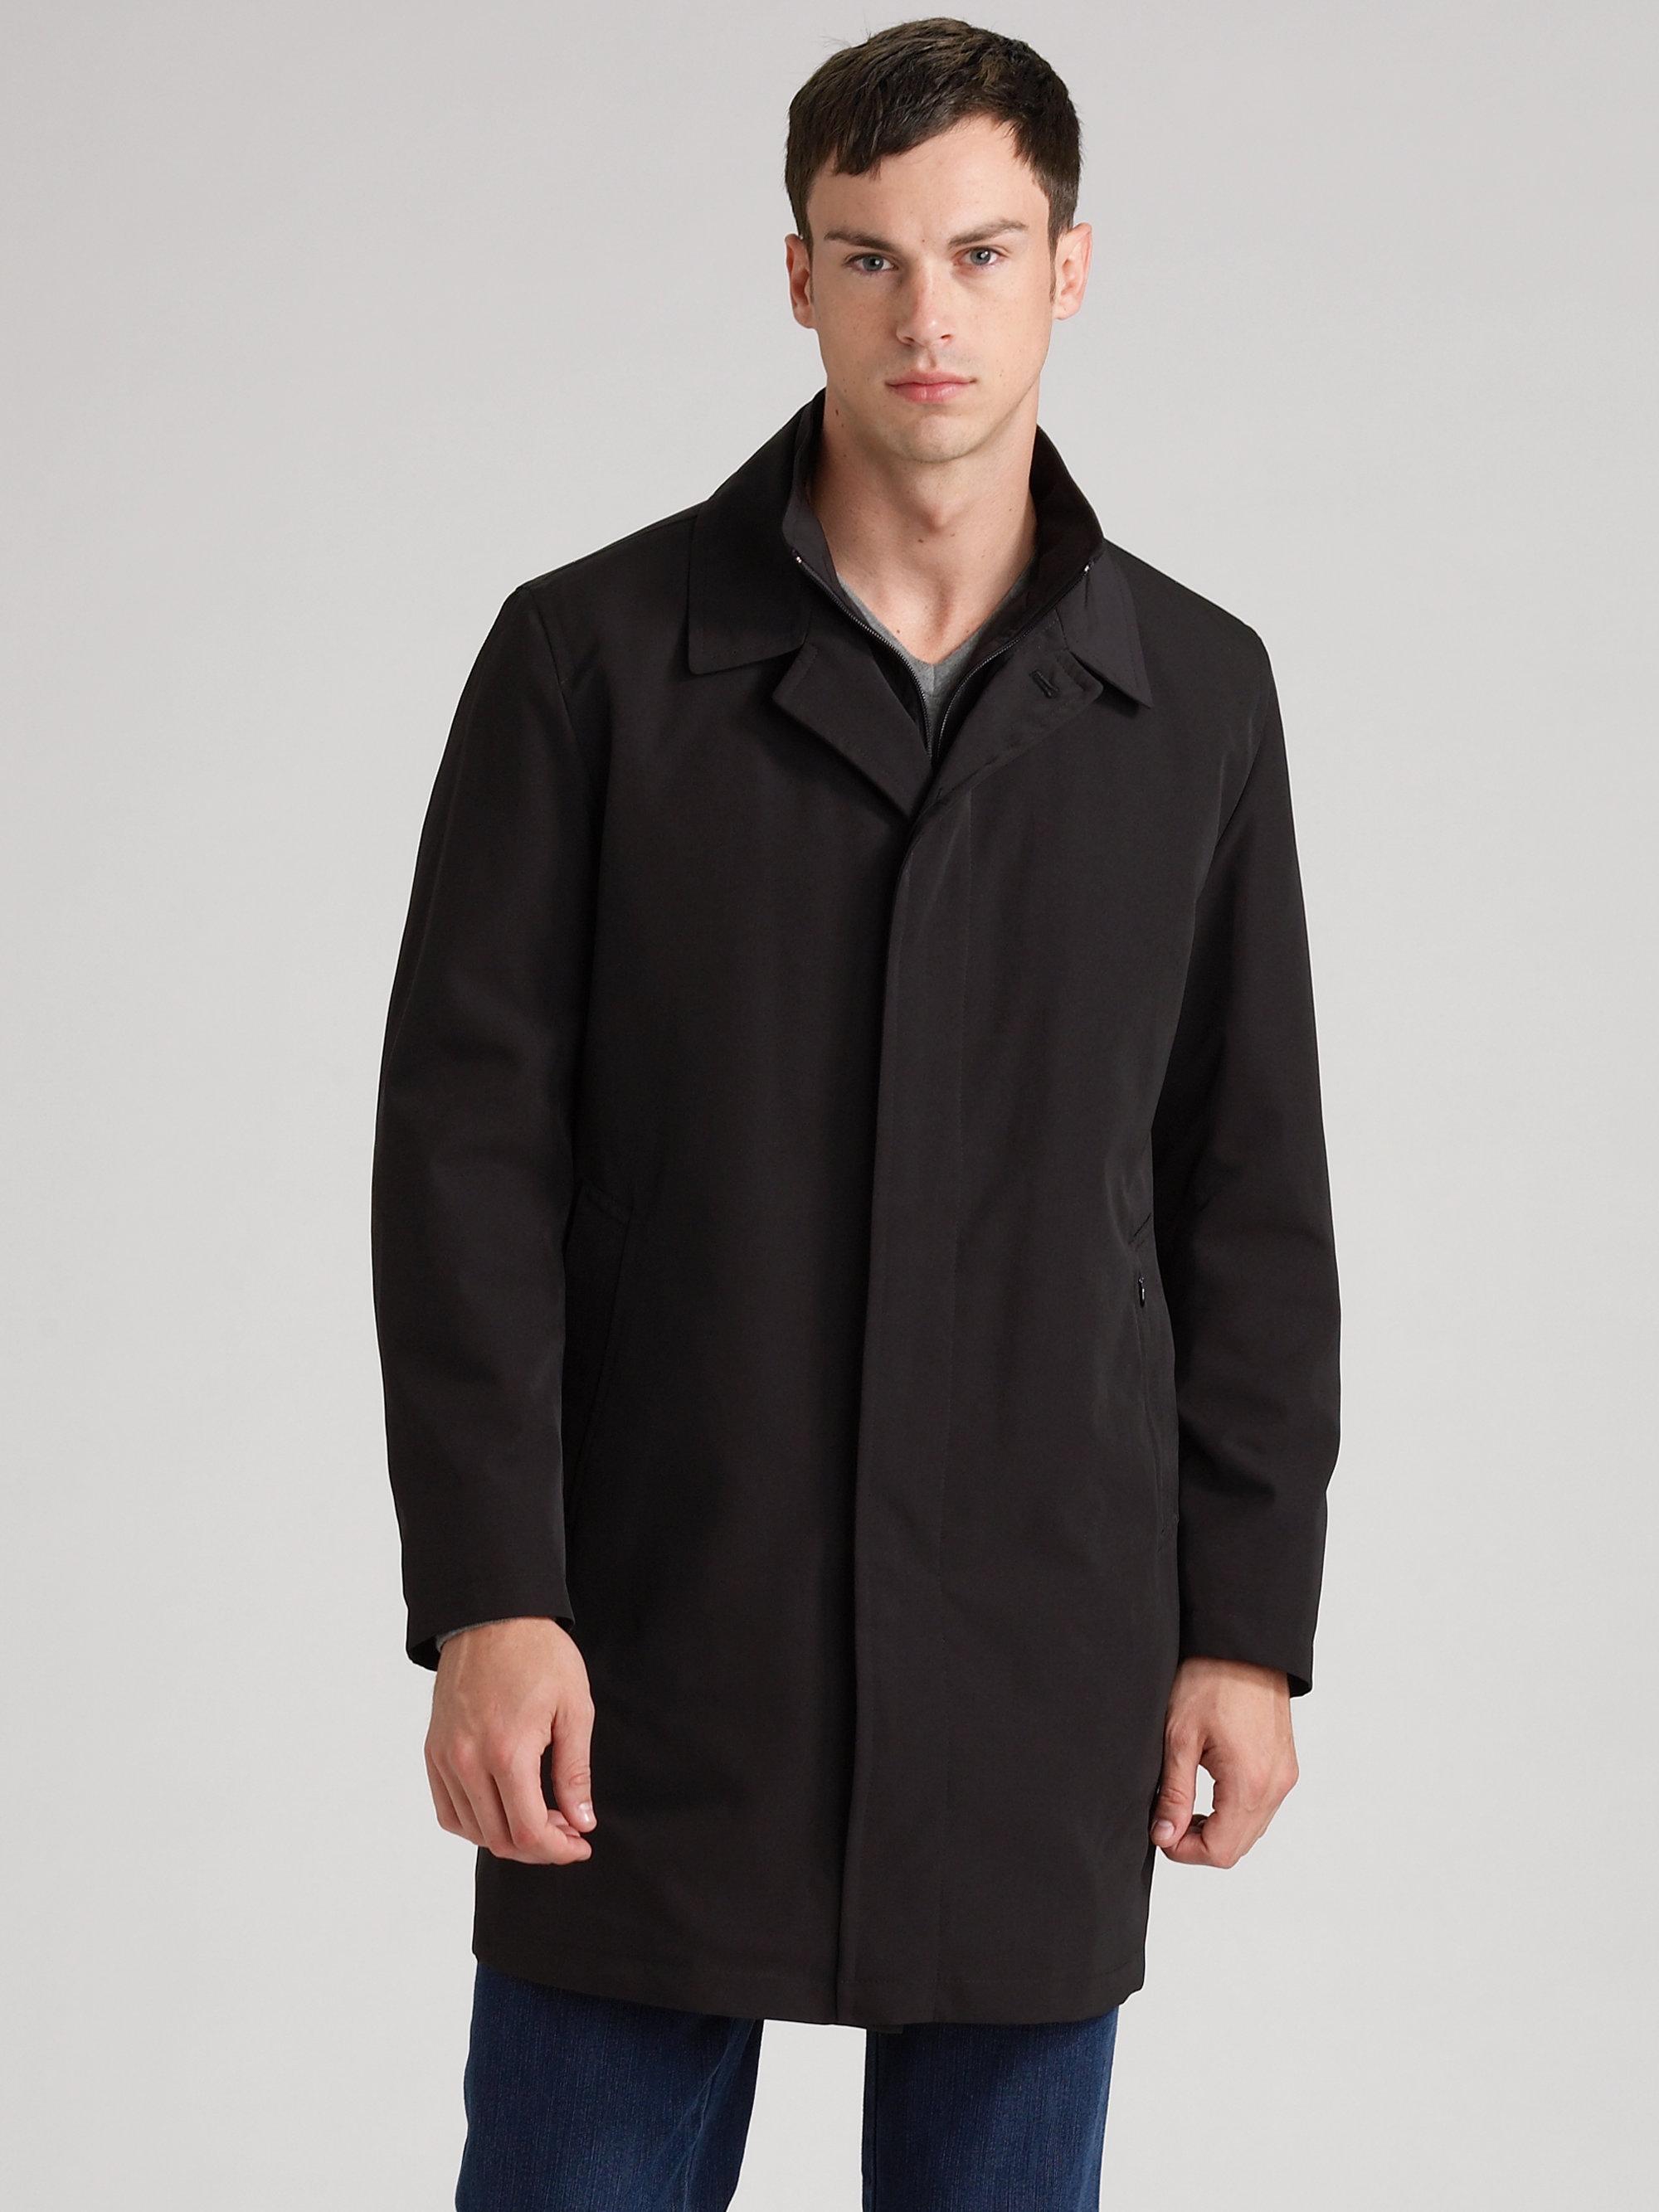 Mens Black Car Coat